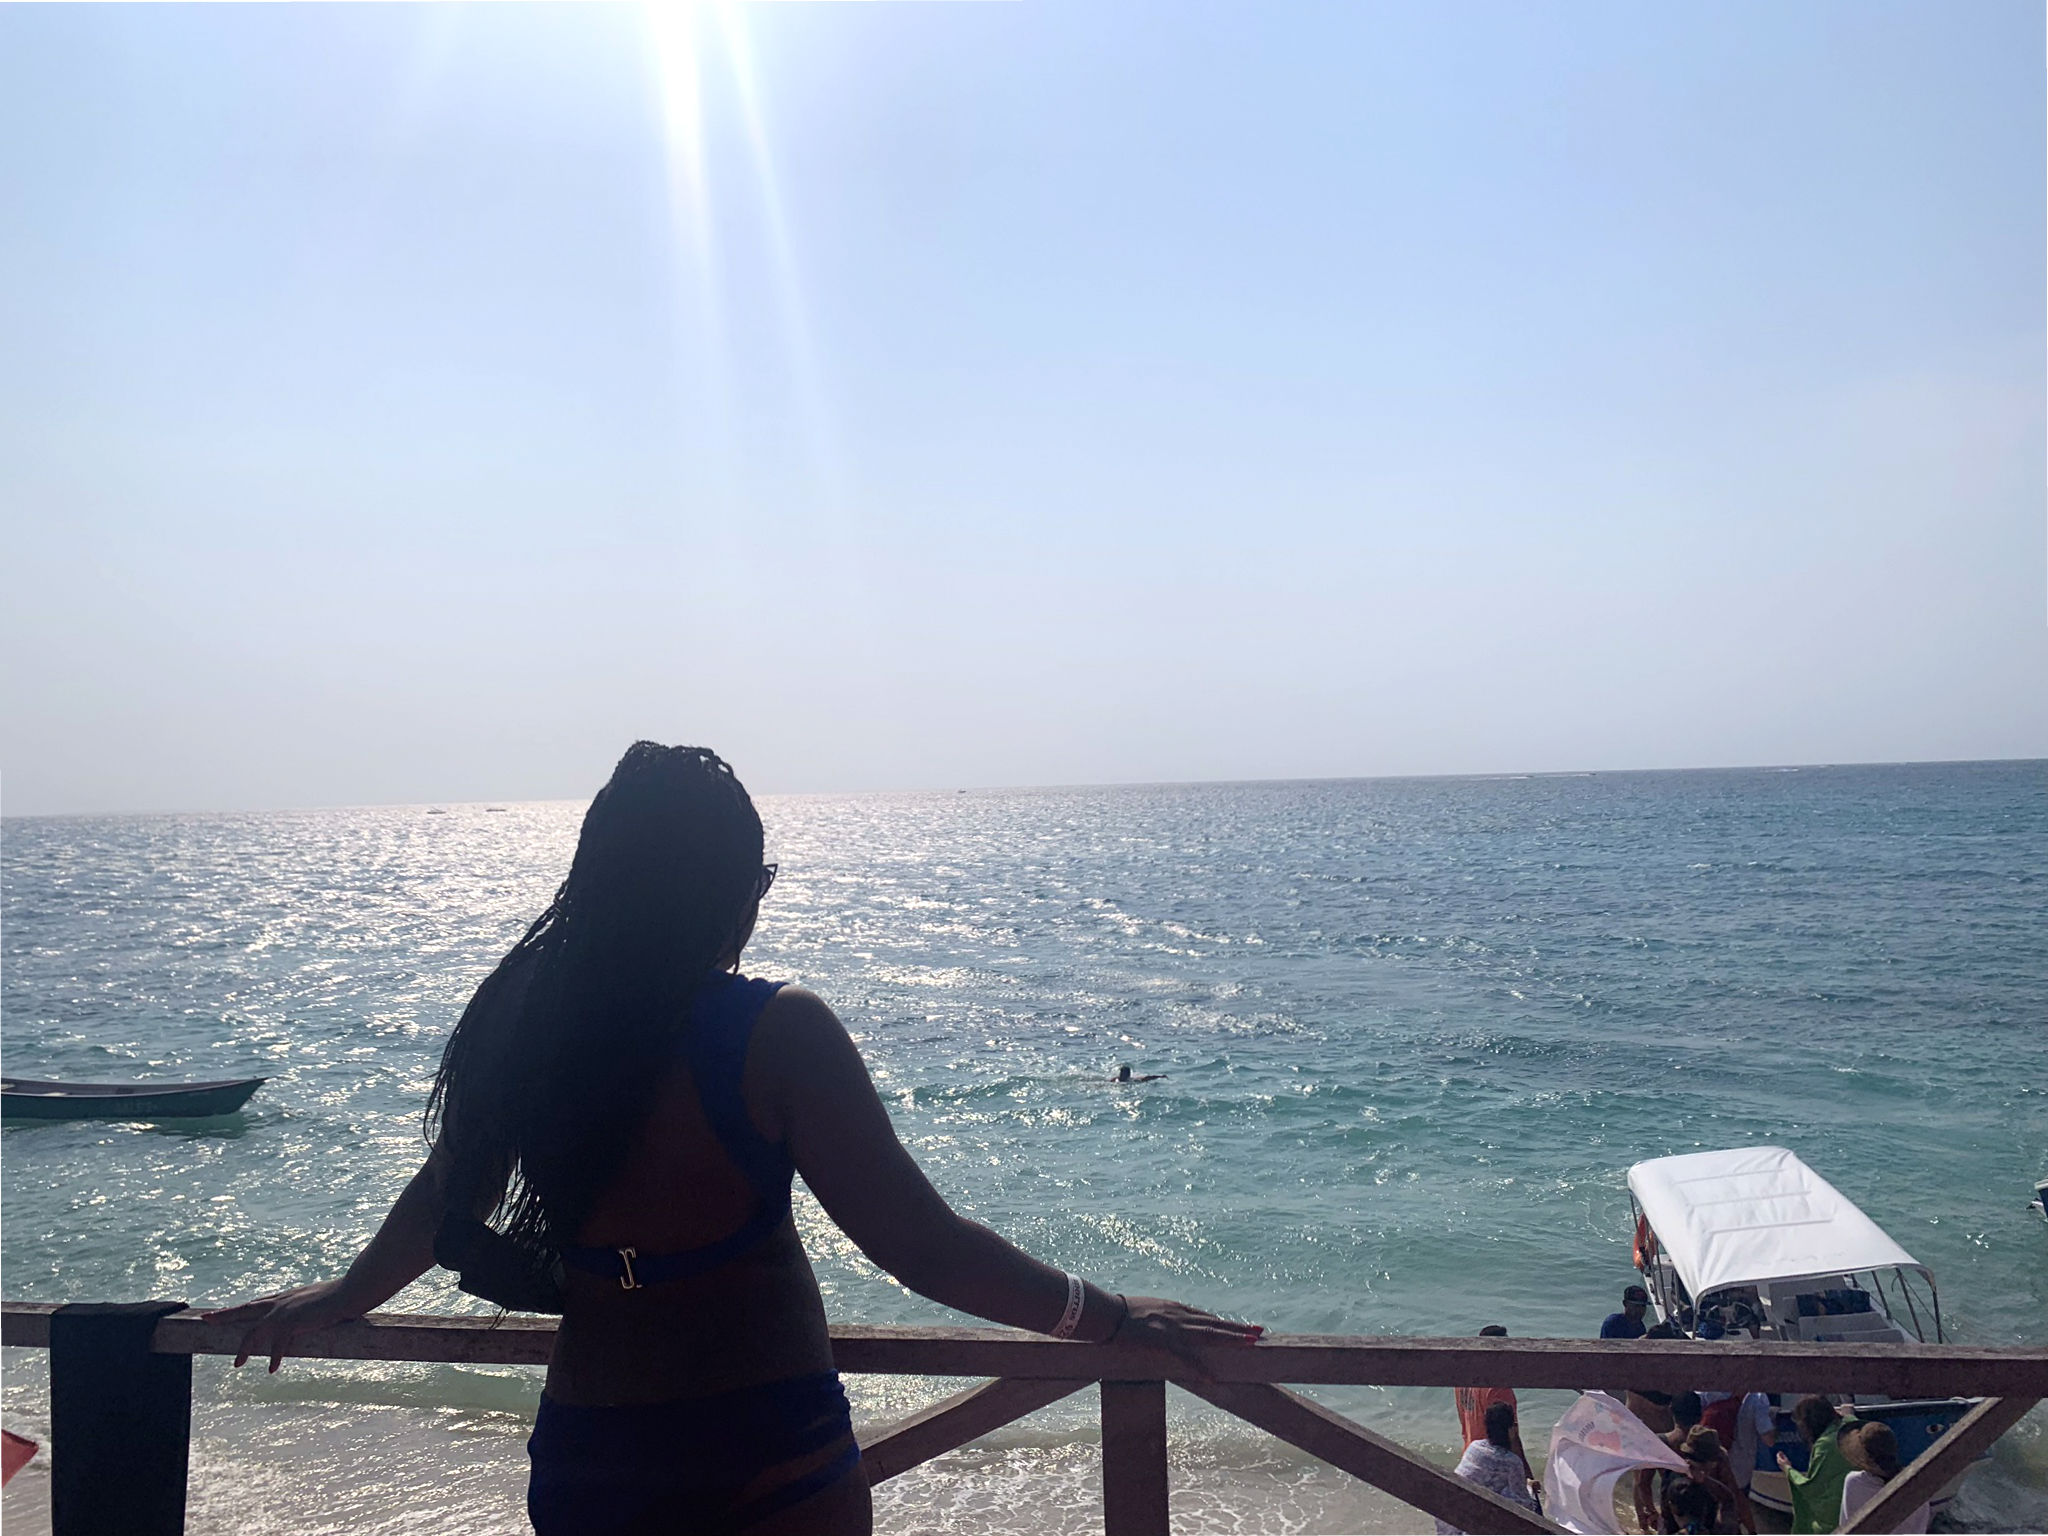 Marthadahhling Where to Stay Cartagena Playa Baru.jpg